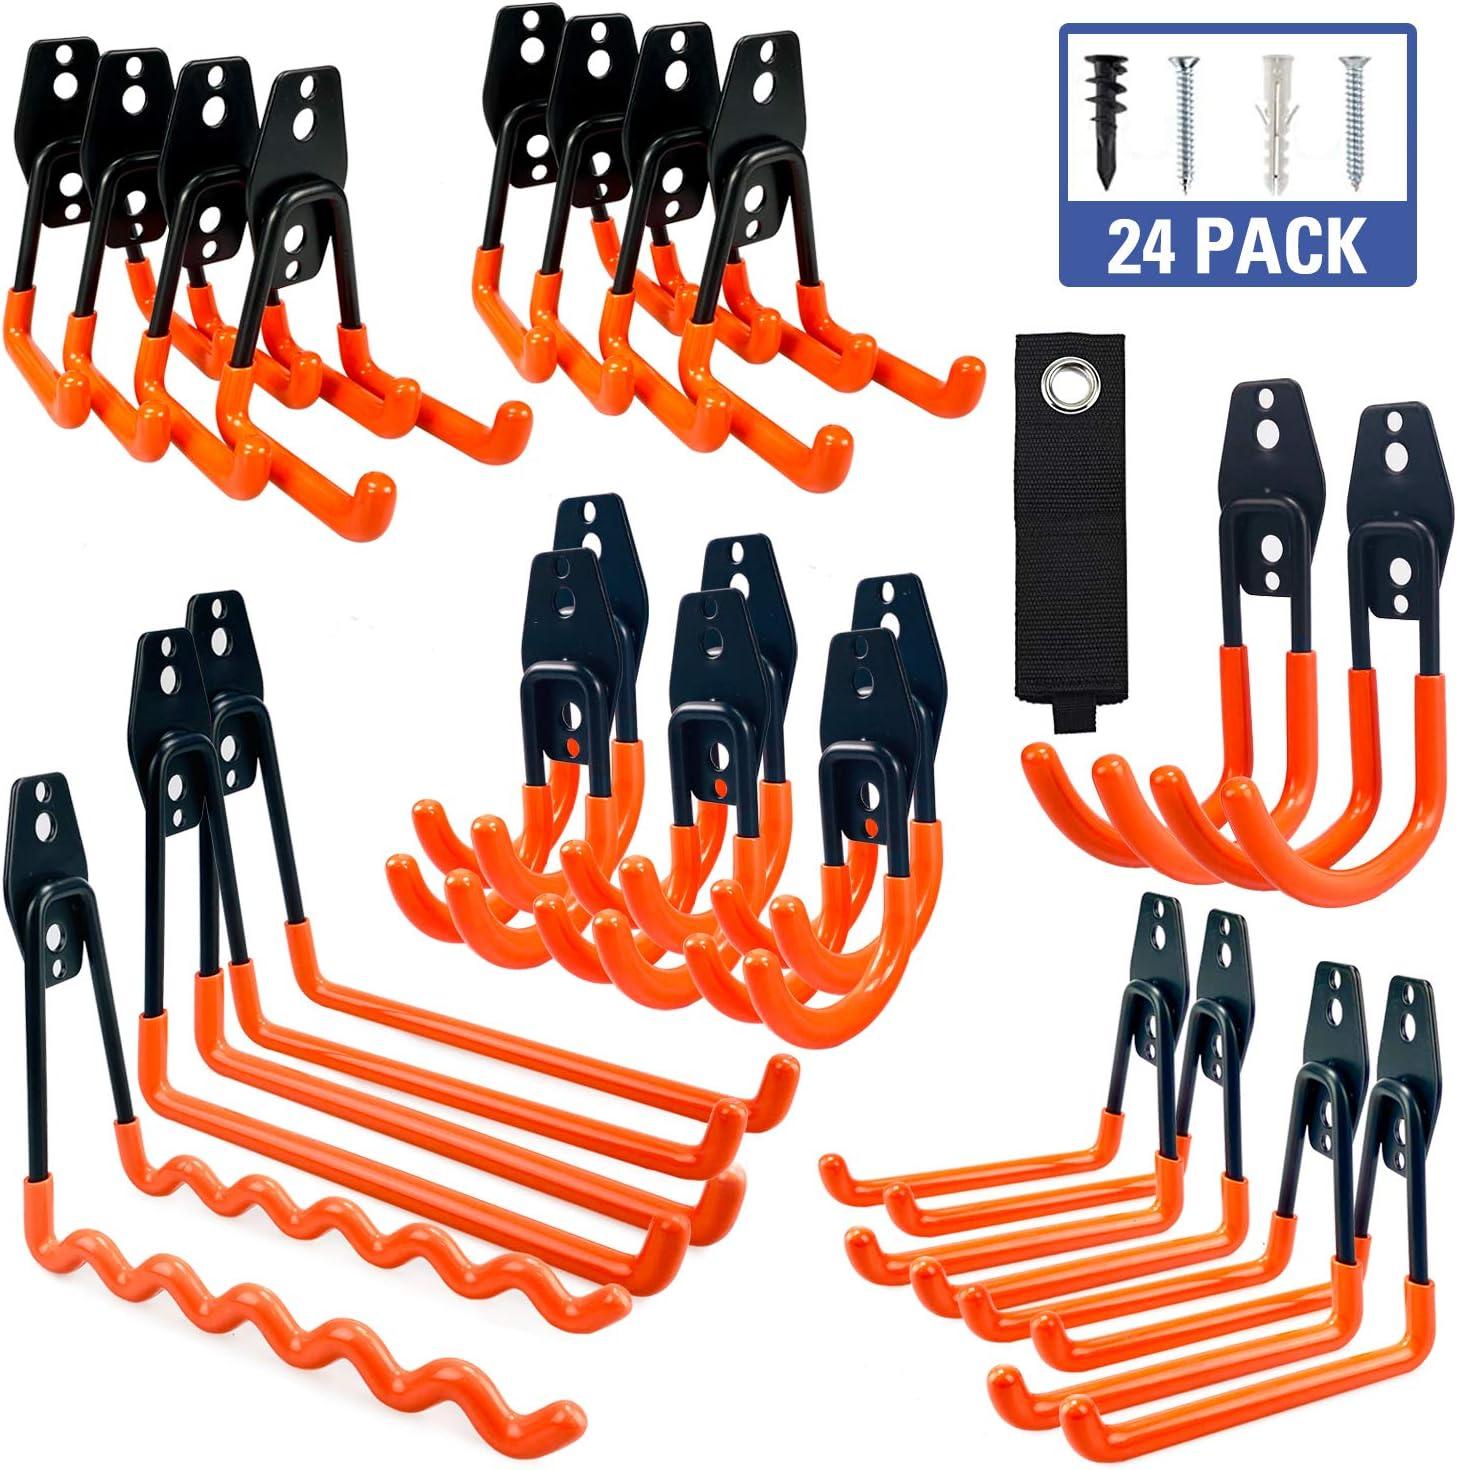 MARVOWARE Garage Storage Hooks, 24 Pack Steel Heavy Duty Organizer, Anti-Slip Double Wall Mount Holder, Utility Power Tool Hangers for Ladder, Garden Tools, Bike, Hoses, Ropes&Bulky Items Organization